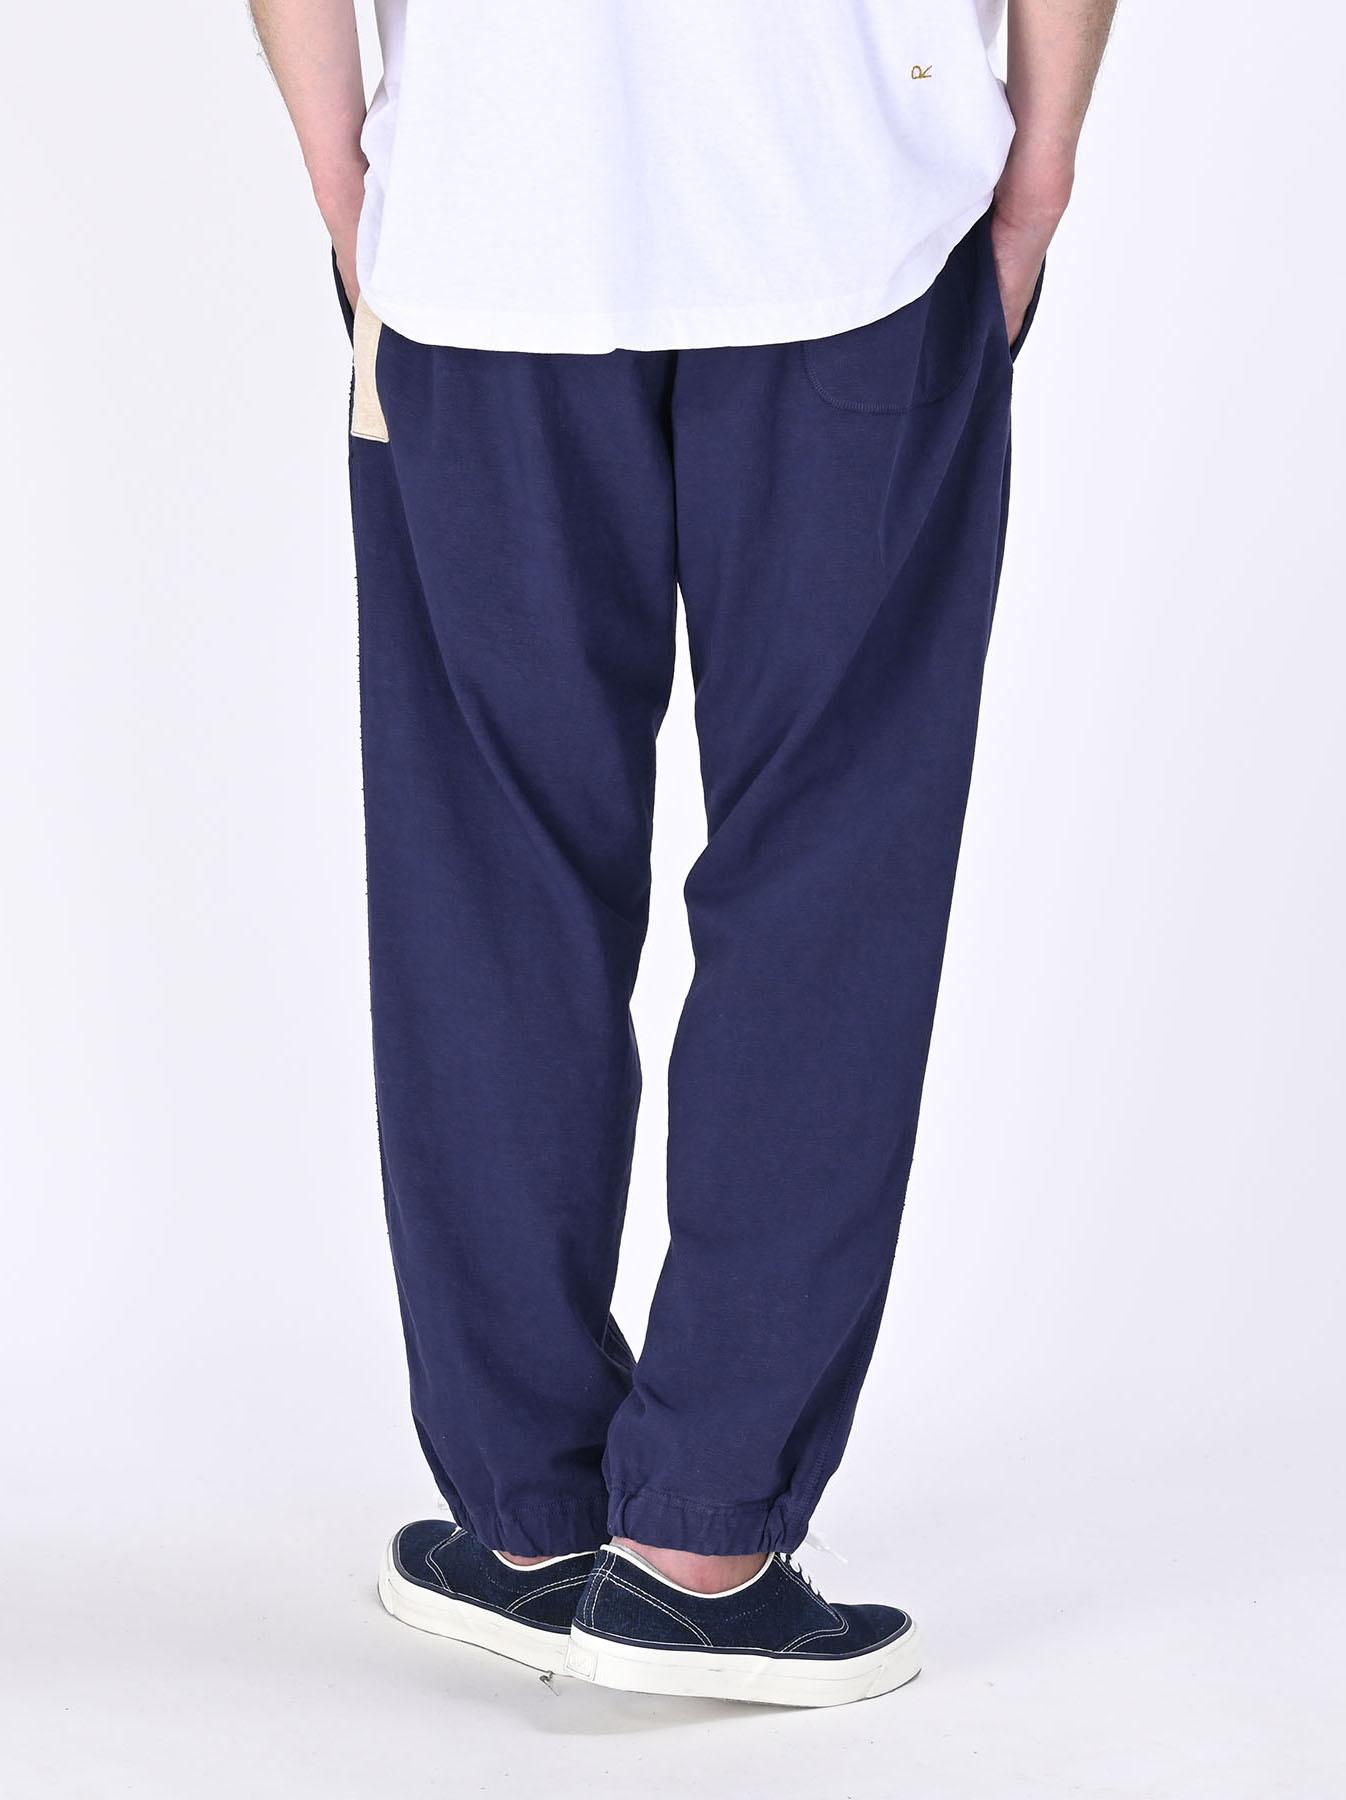 Dekoboko Tenjiku Regatta Pants (0621)-7